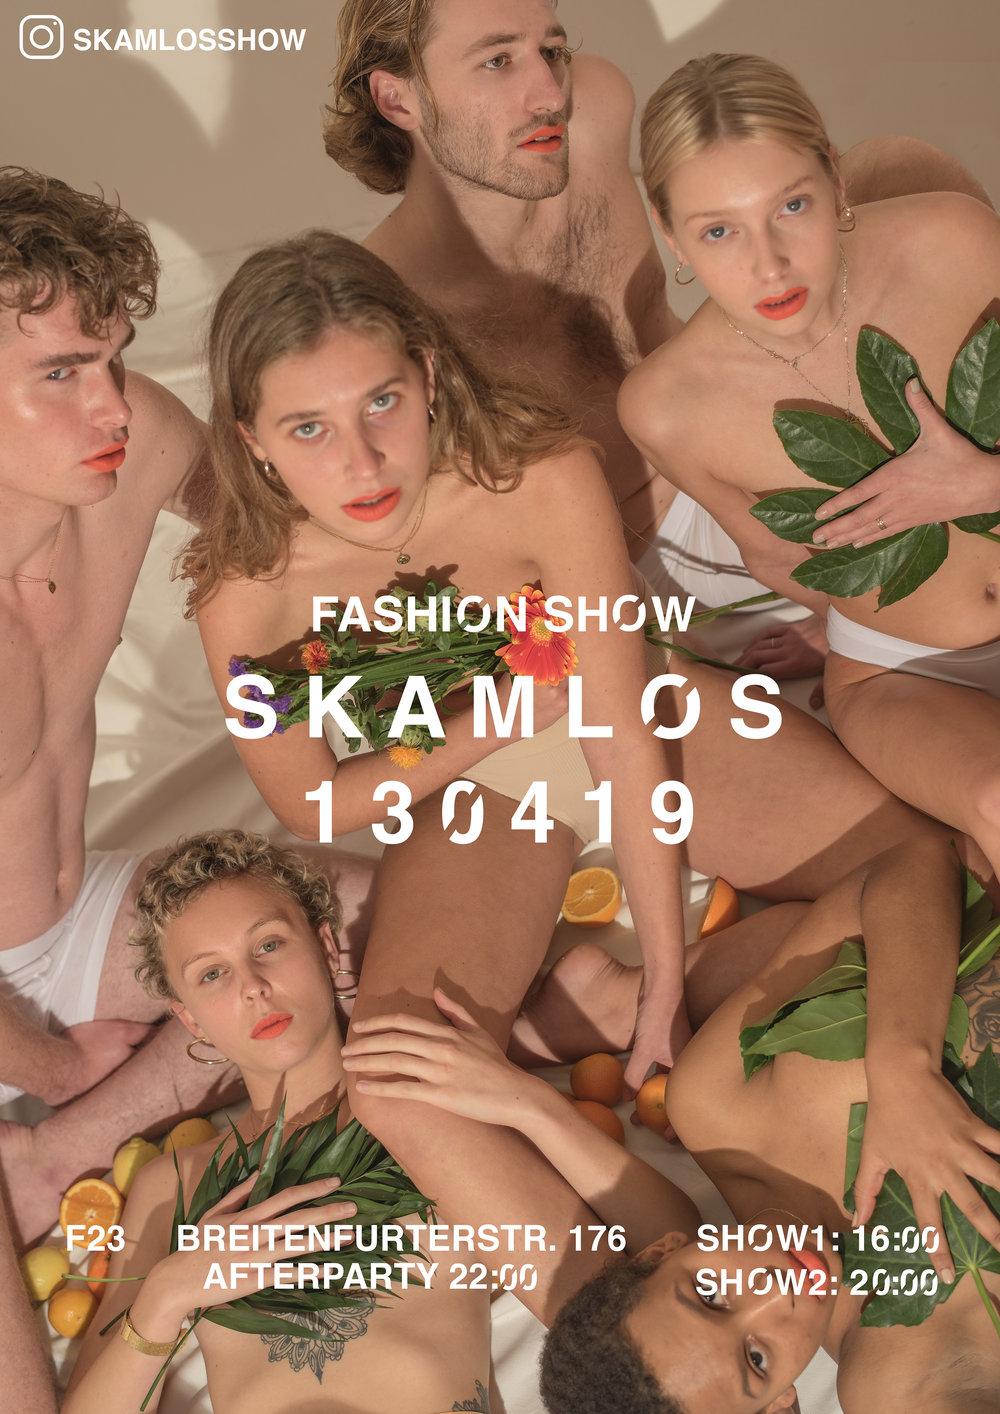 SkamlosShow01.jpg